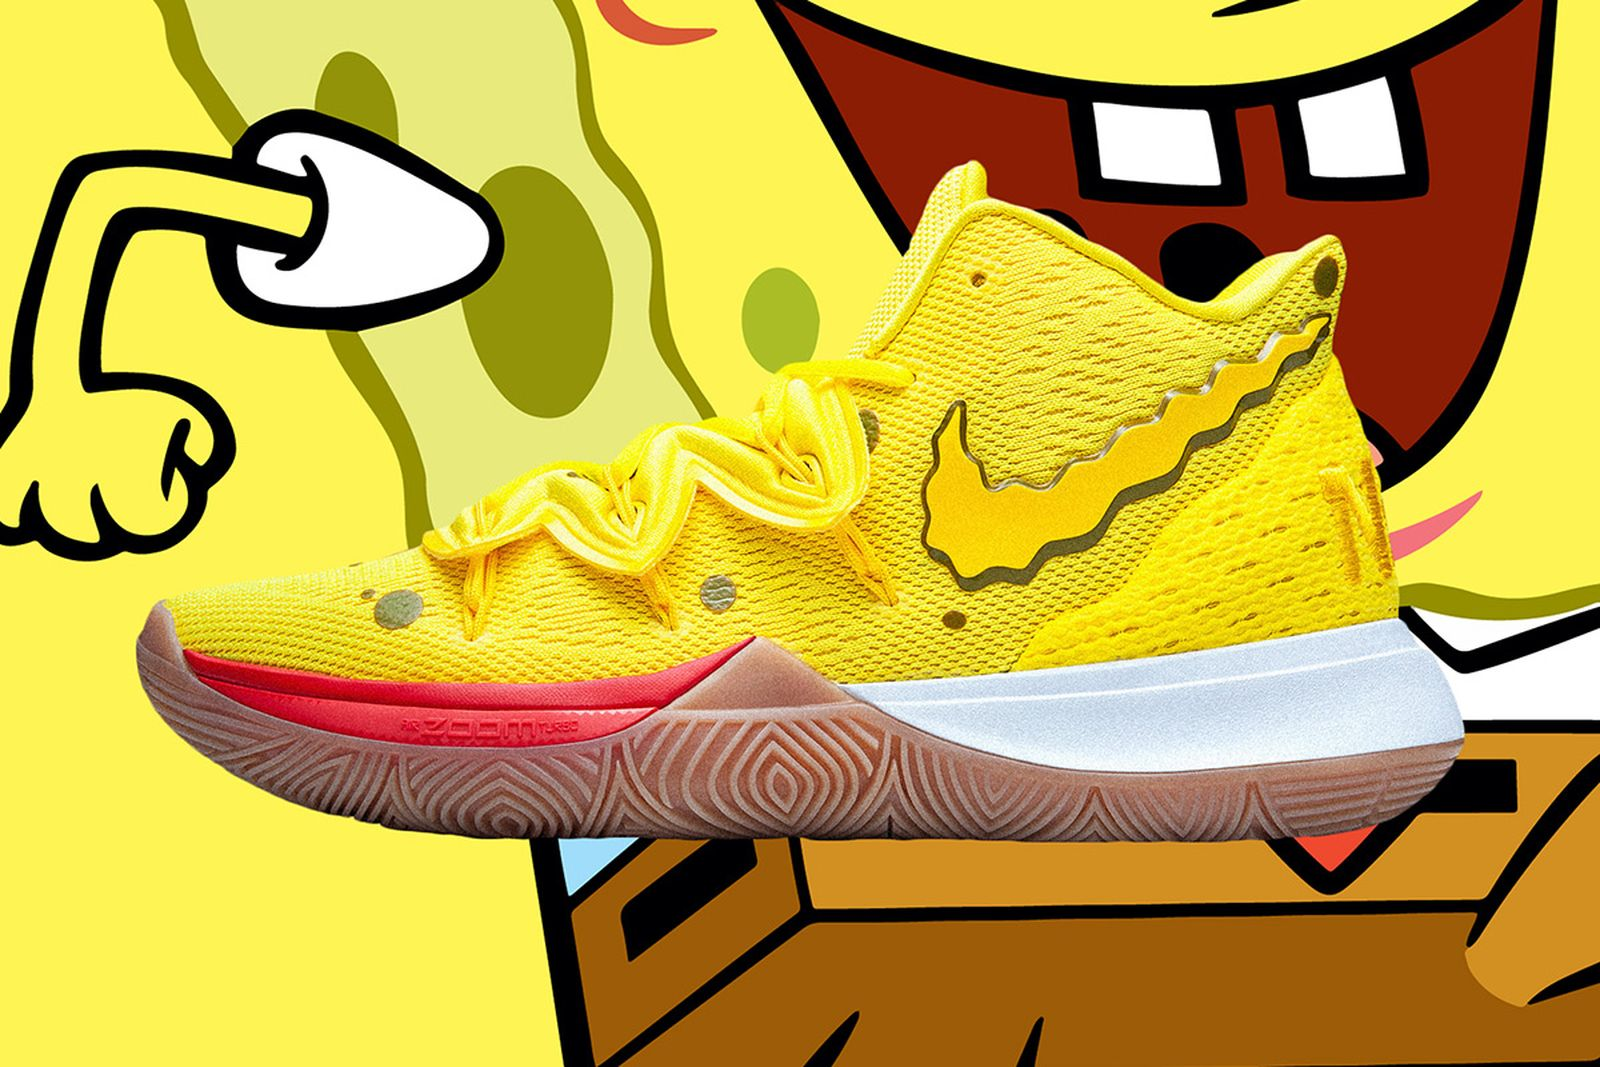 spongebob squarepants nike buy online StockX